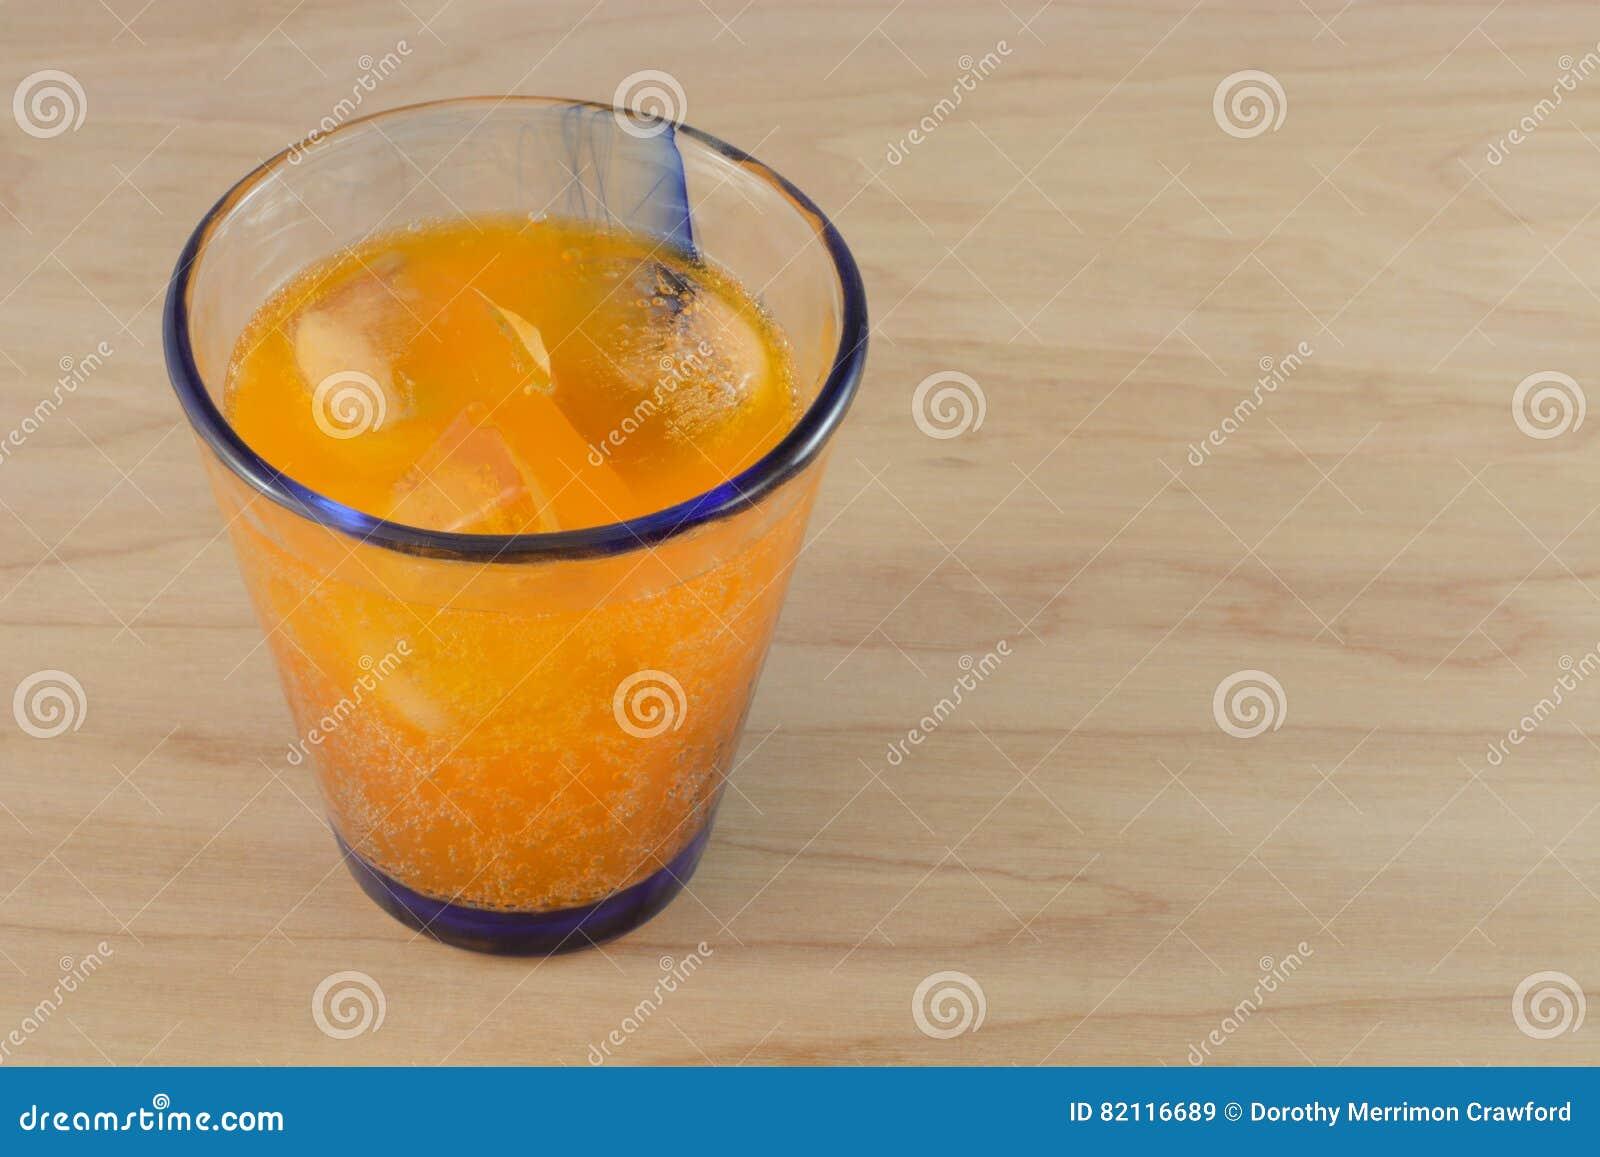 Bruit de bicarbonate de soude orange